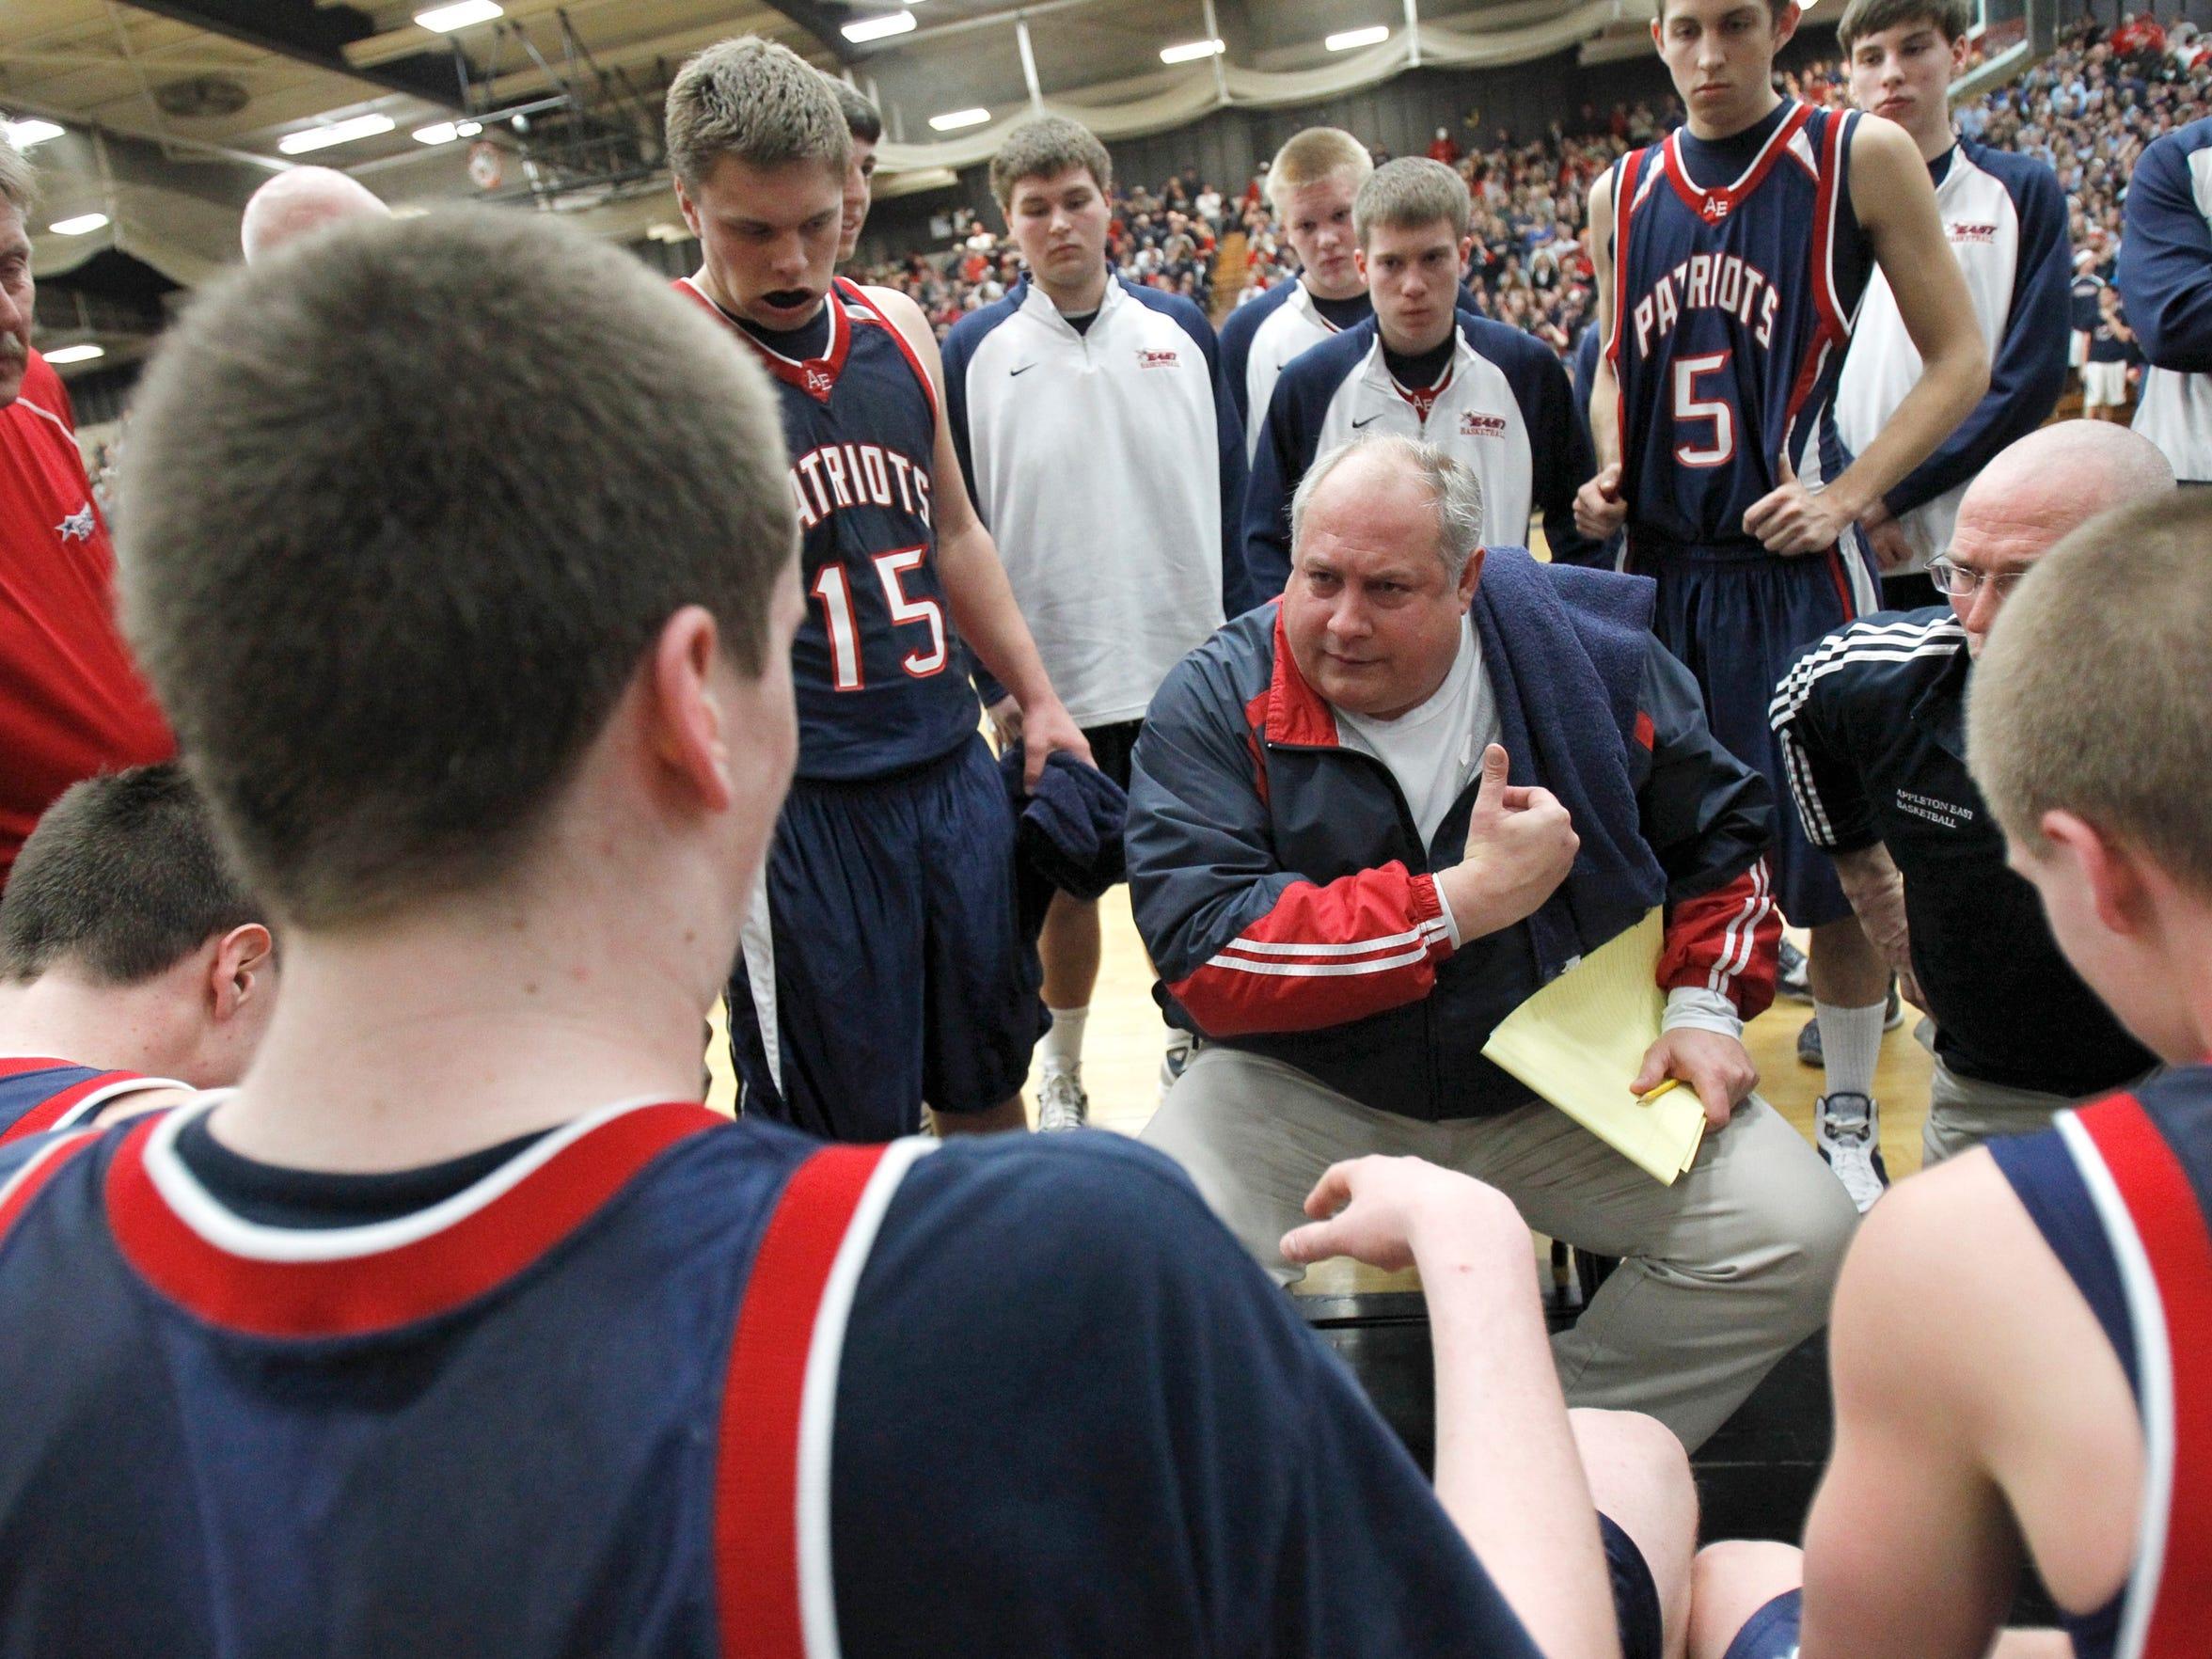 Appleton East High School coach John Mielke talks to